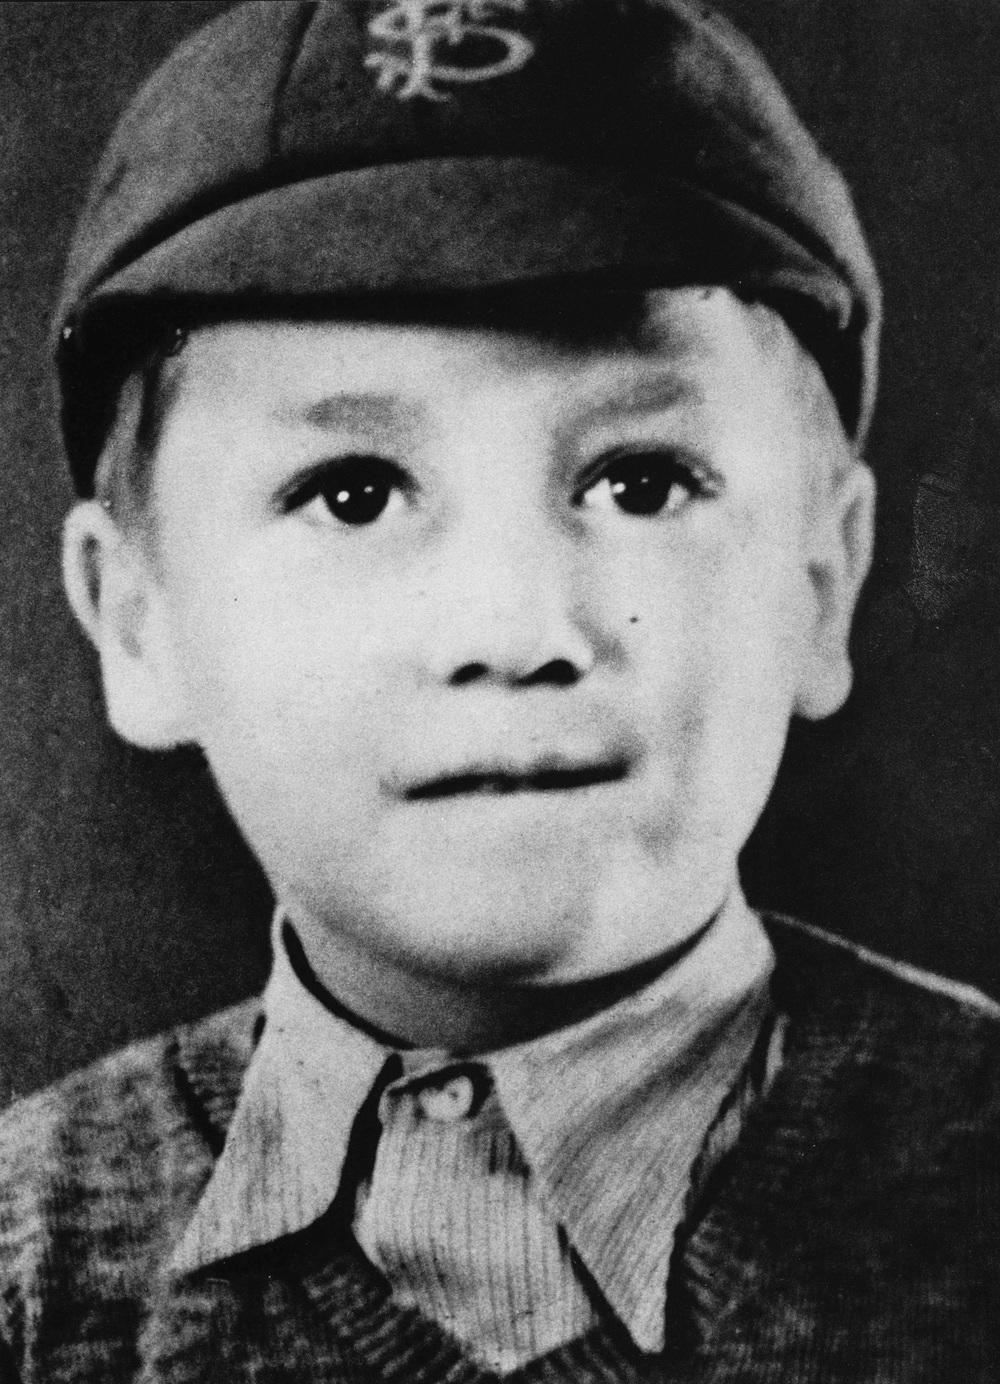 Young John Lennon.